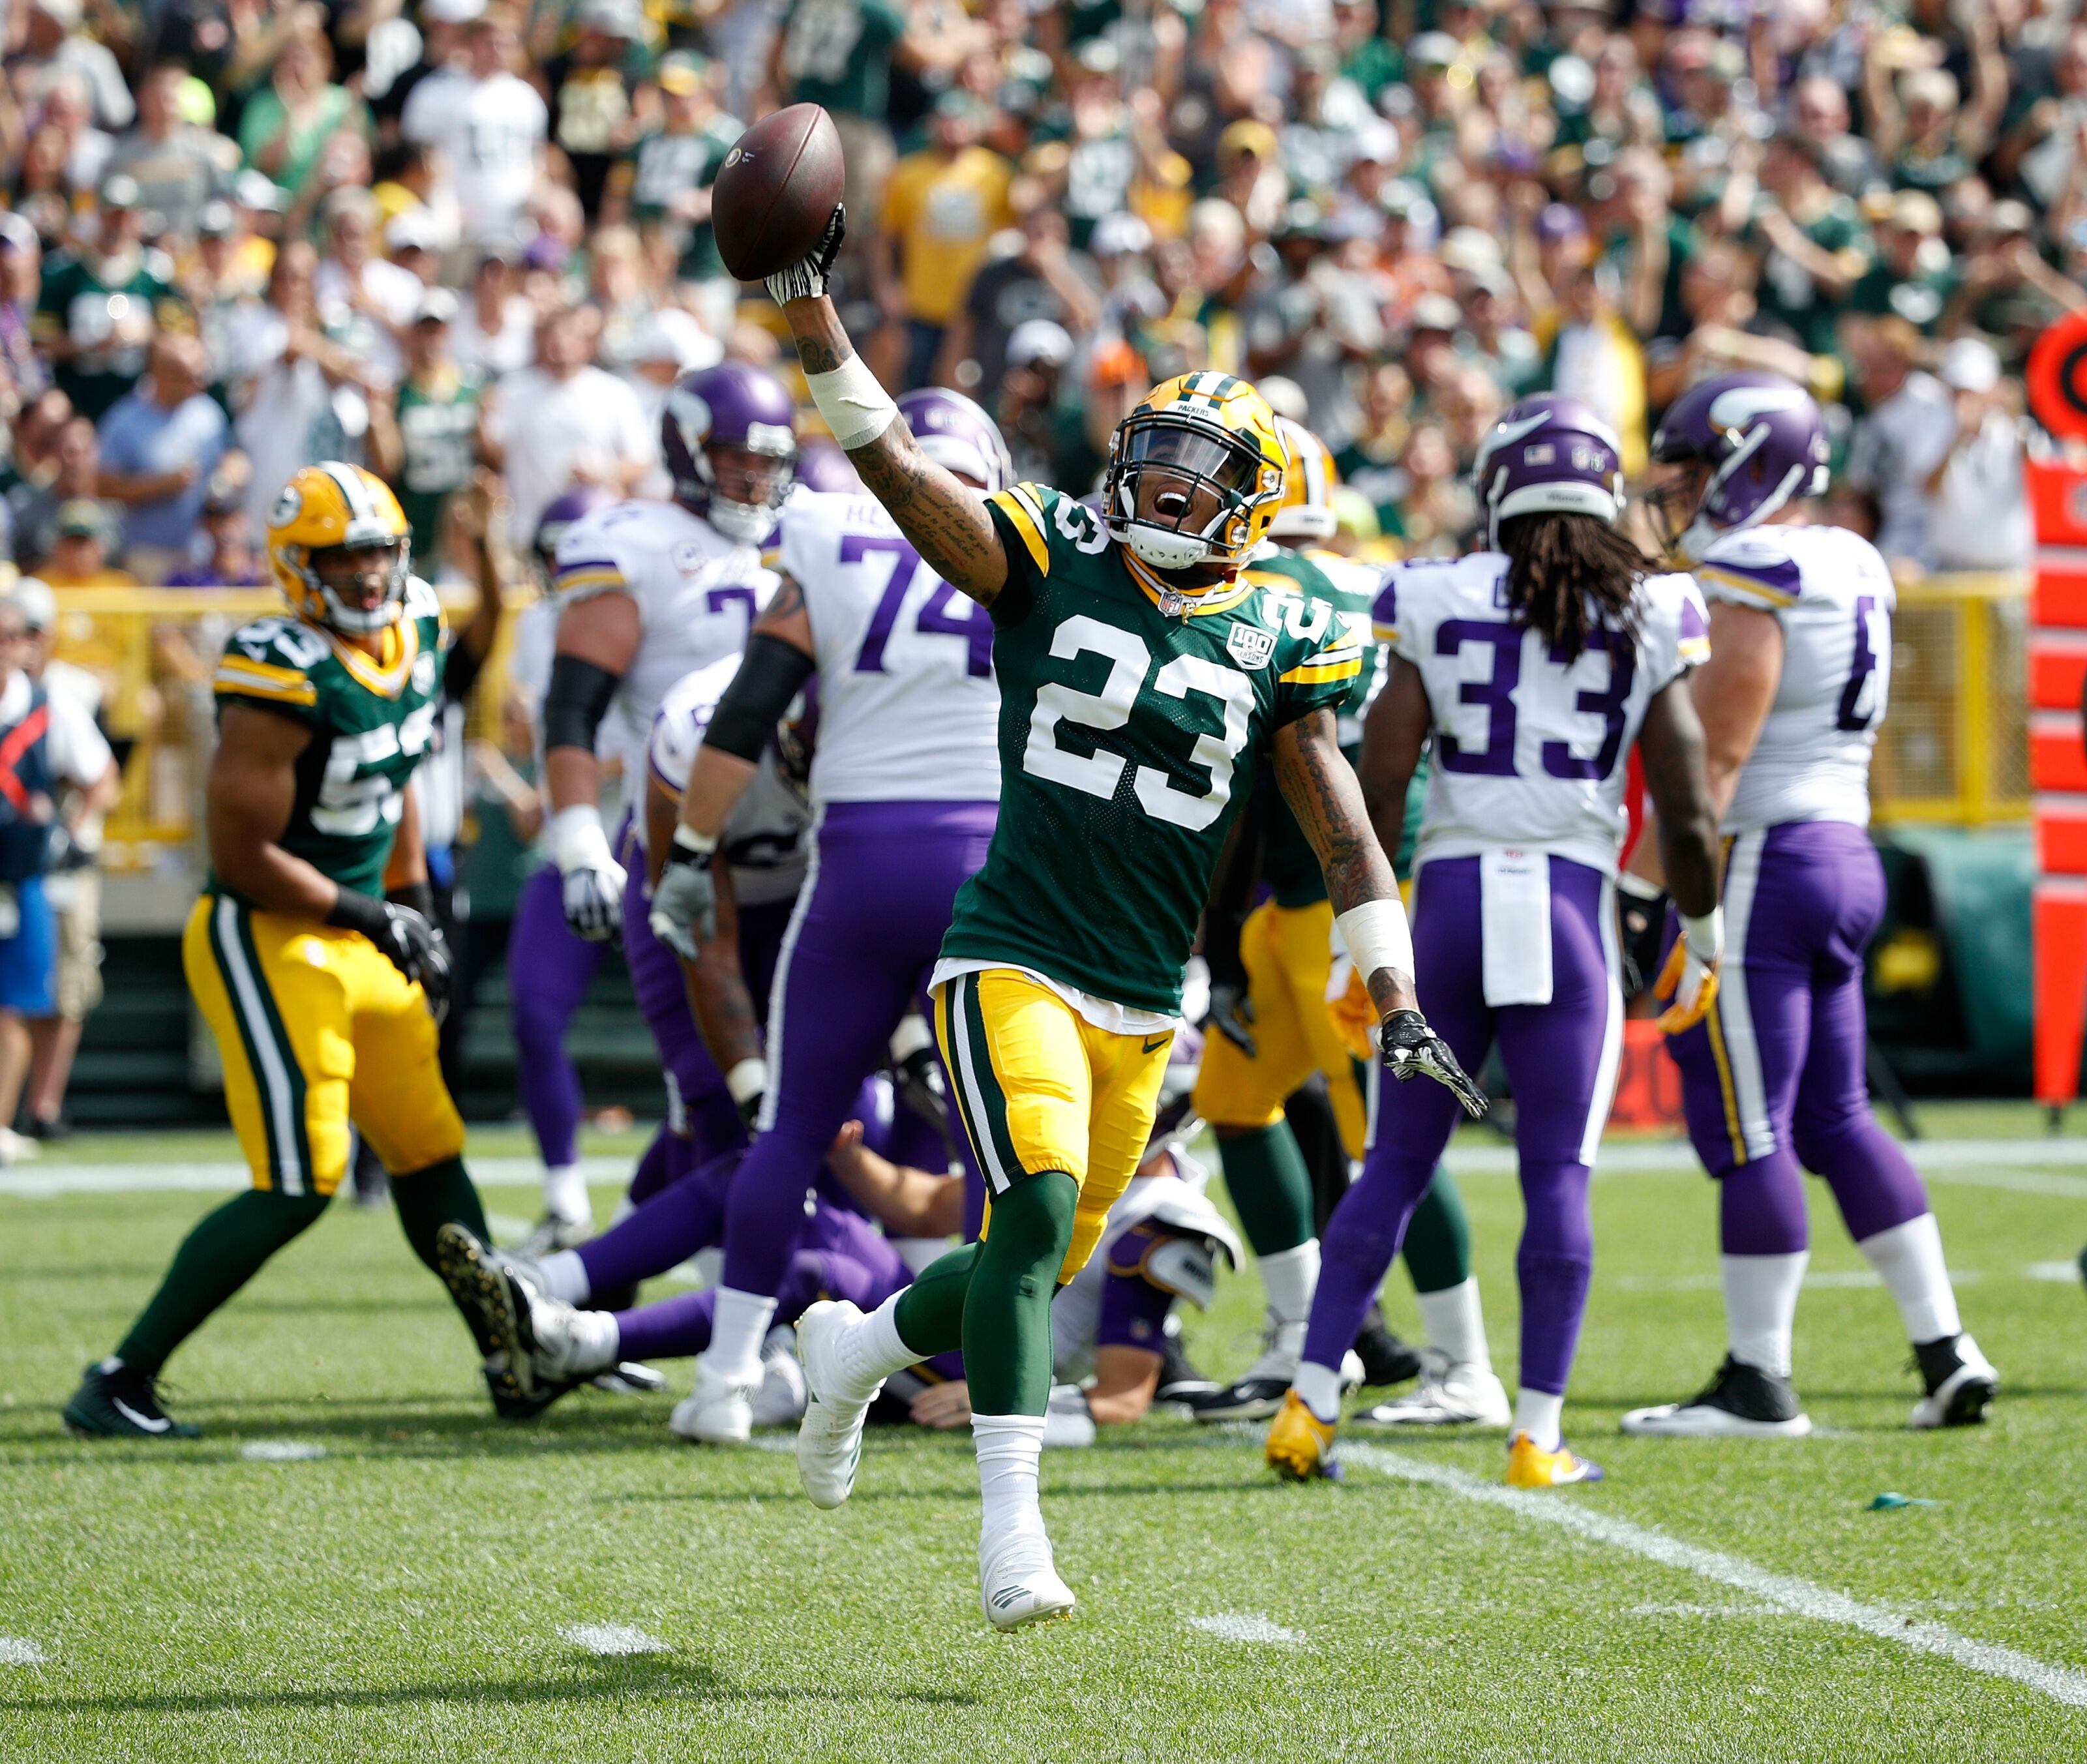 5 reasons why Green Bay Packers will beat Minnesota Vikings in Week 2